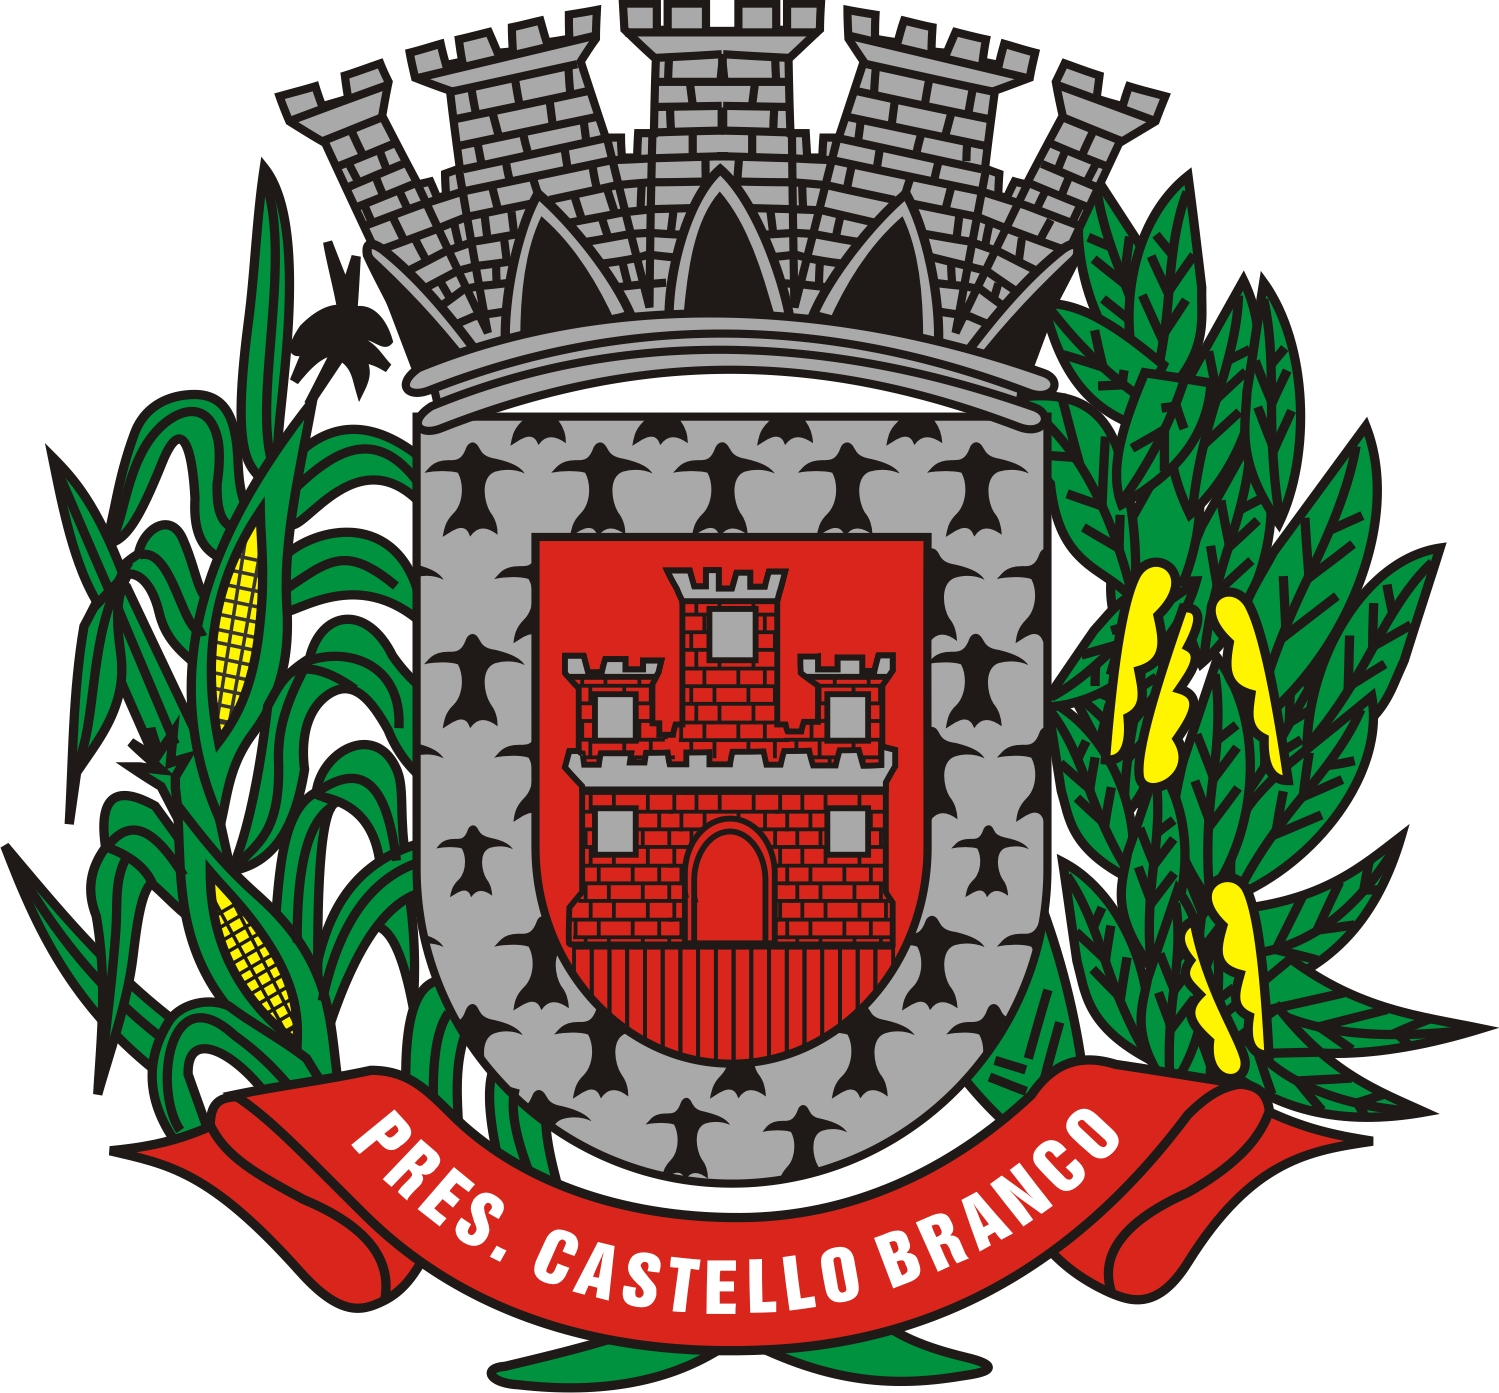 Município de Presidente Castello Branco